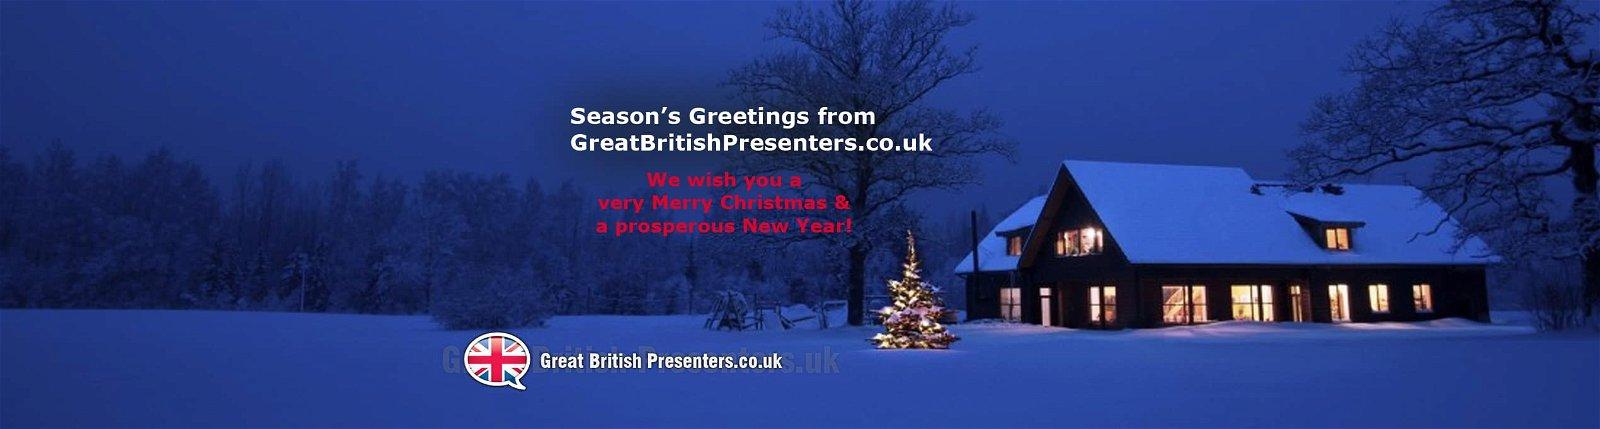 Seasons-Greetings-from-Great-British-Presenters